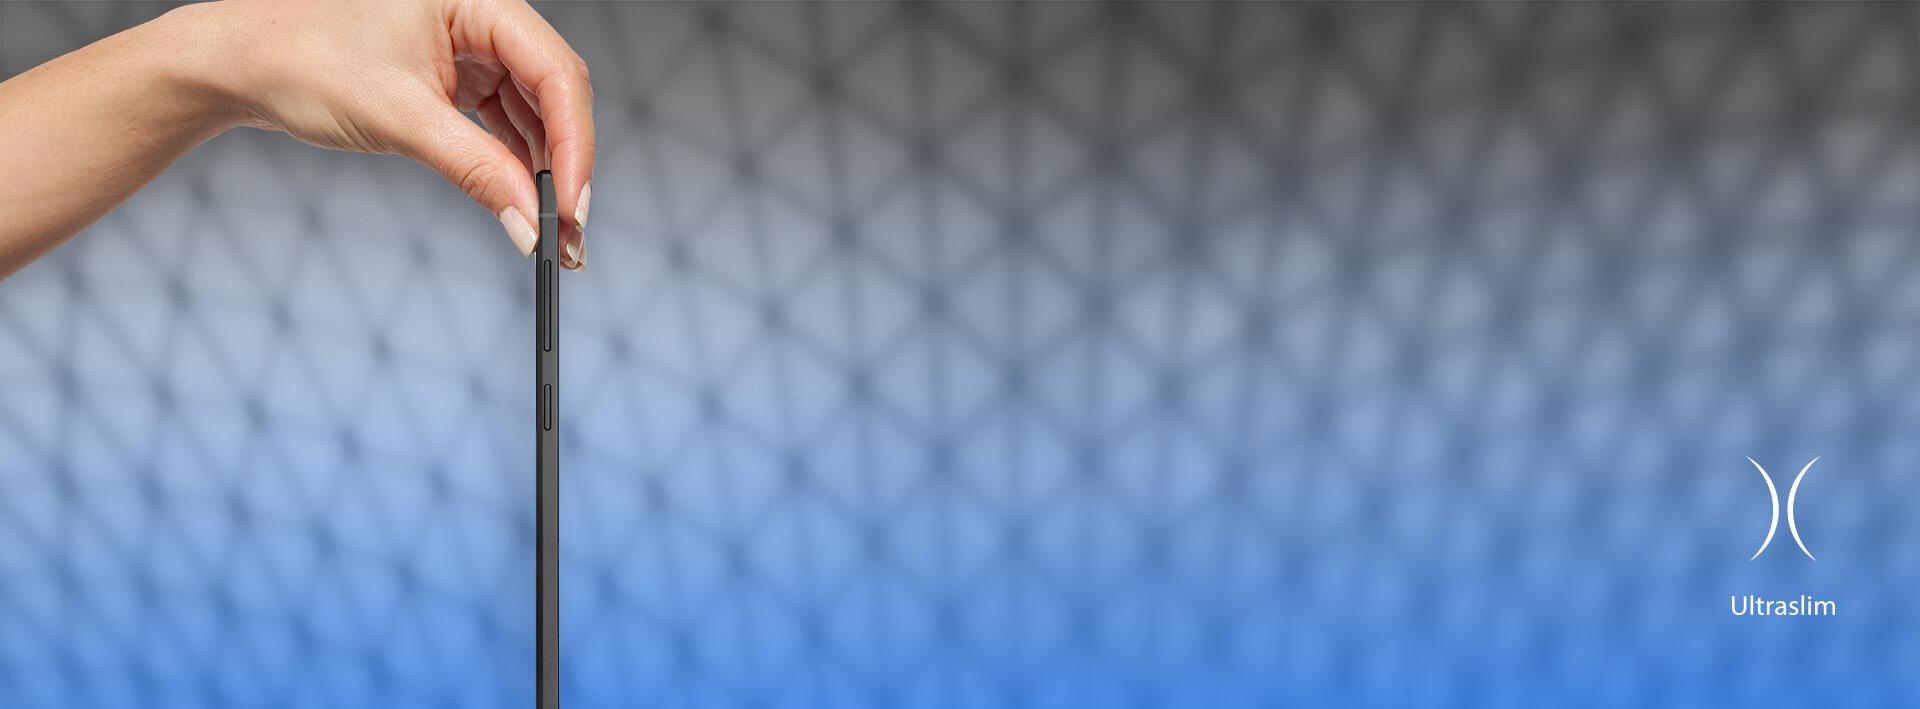 1920x709px_BLOCCO_01